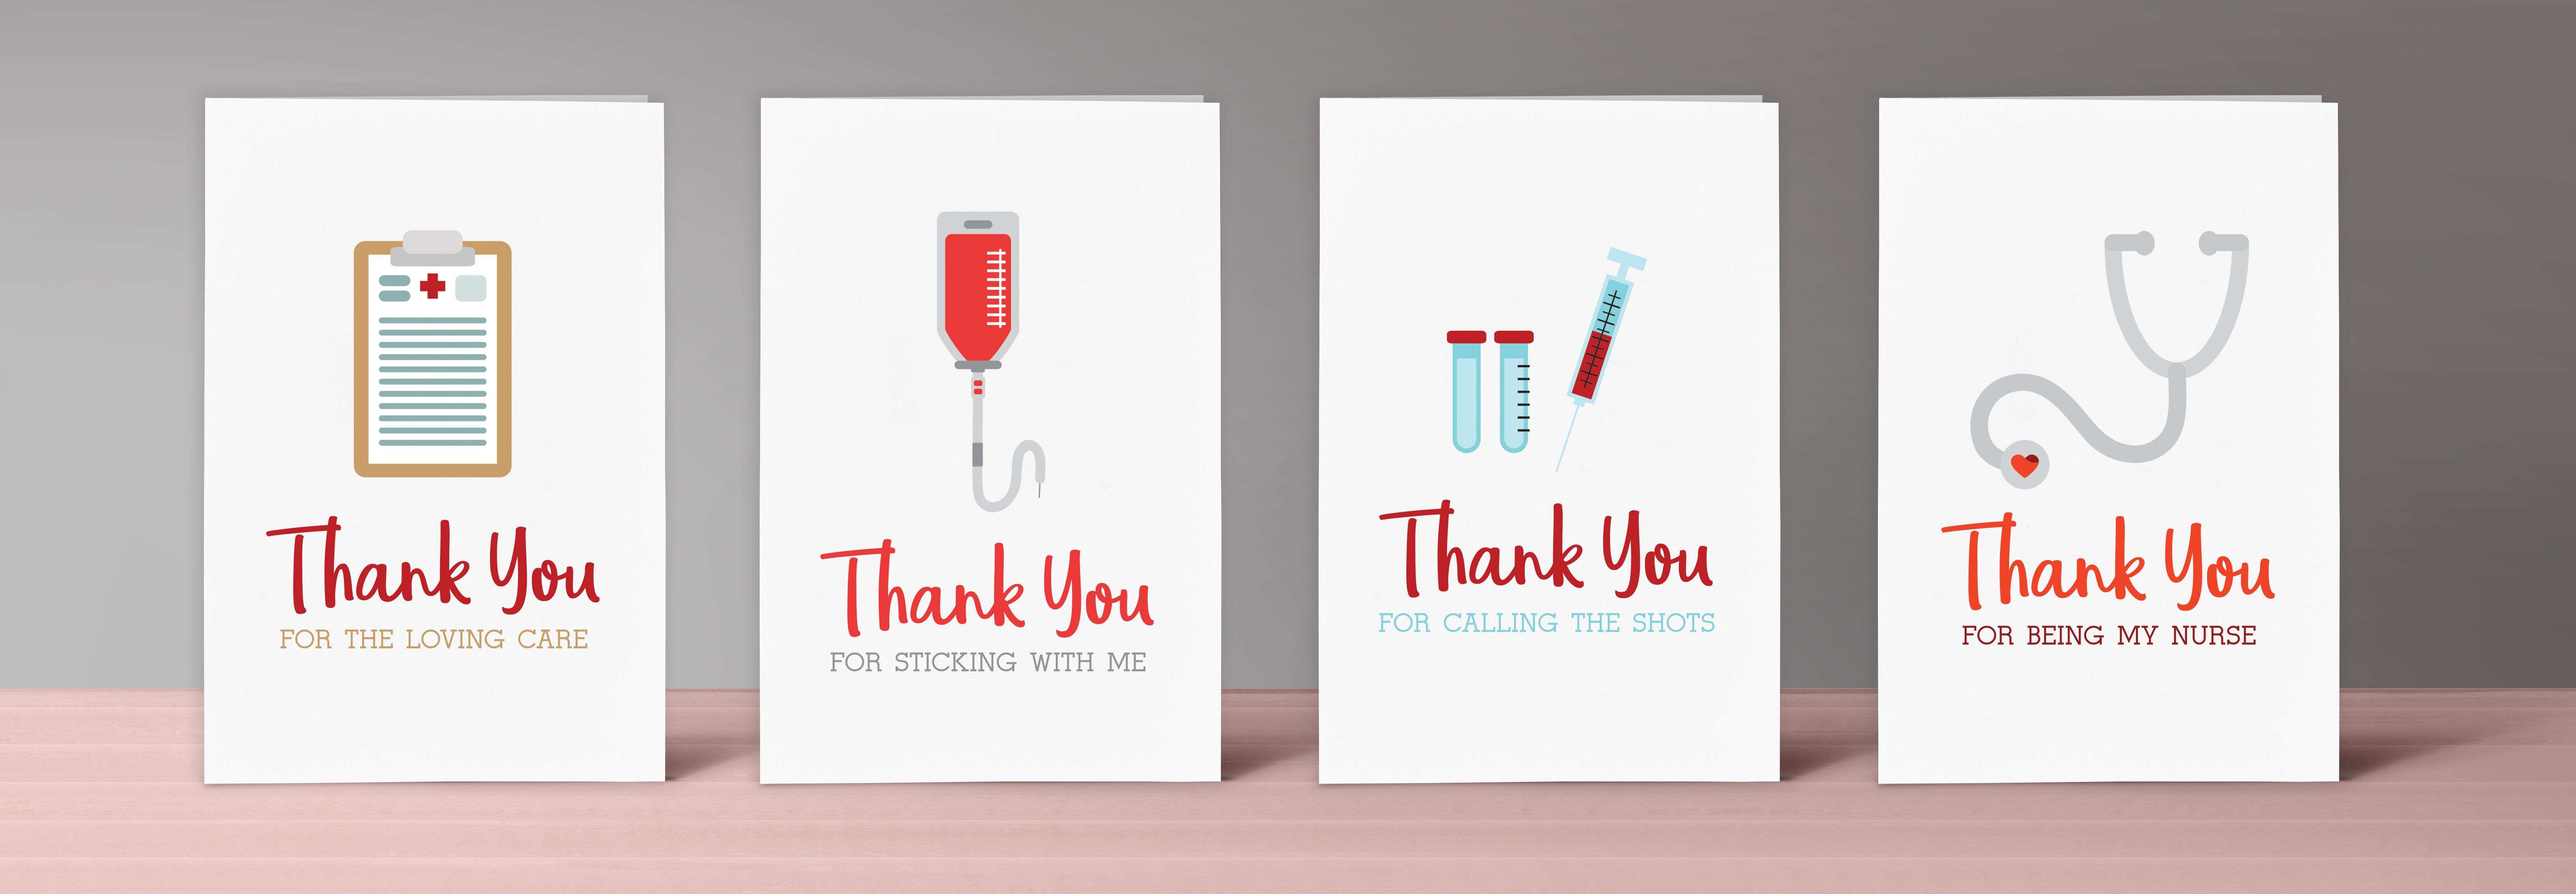 printable nurse thank you cards  u2013 set of 4